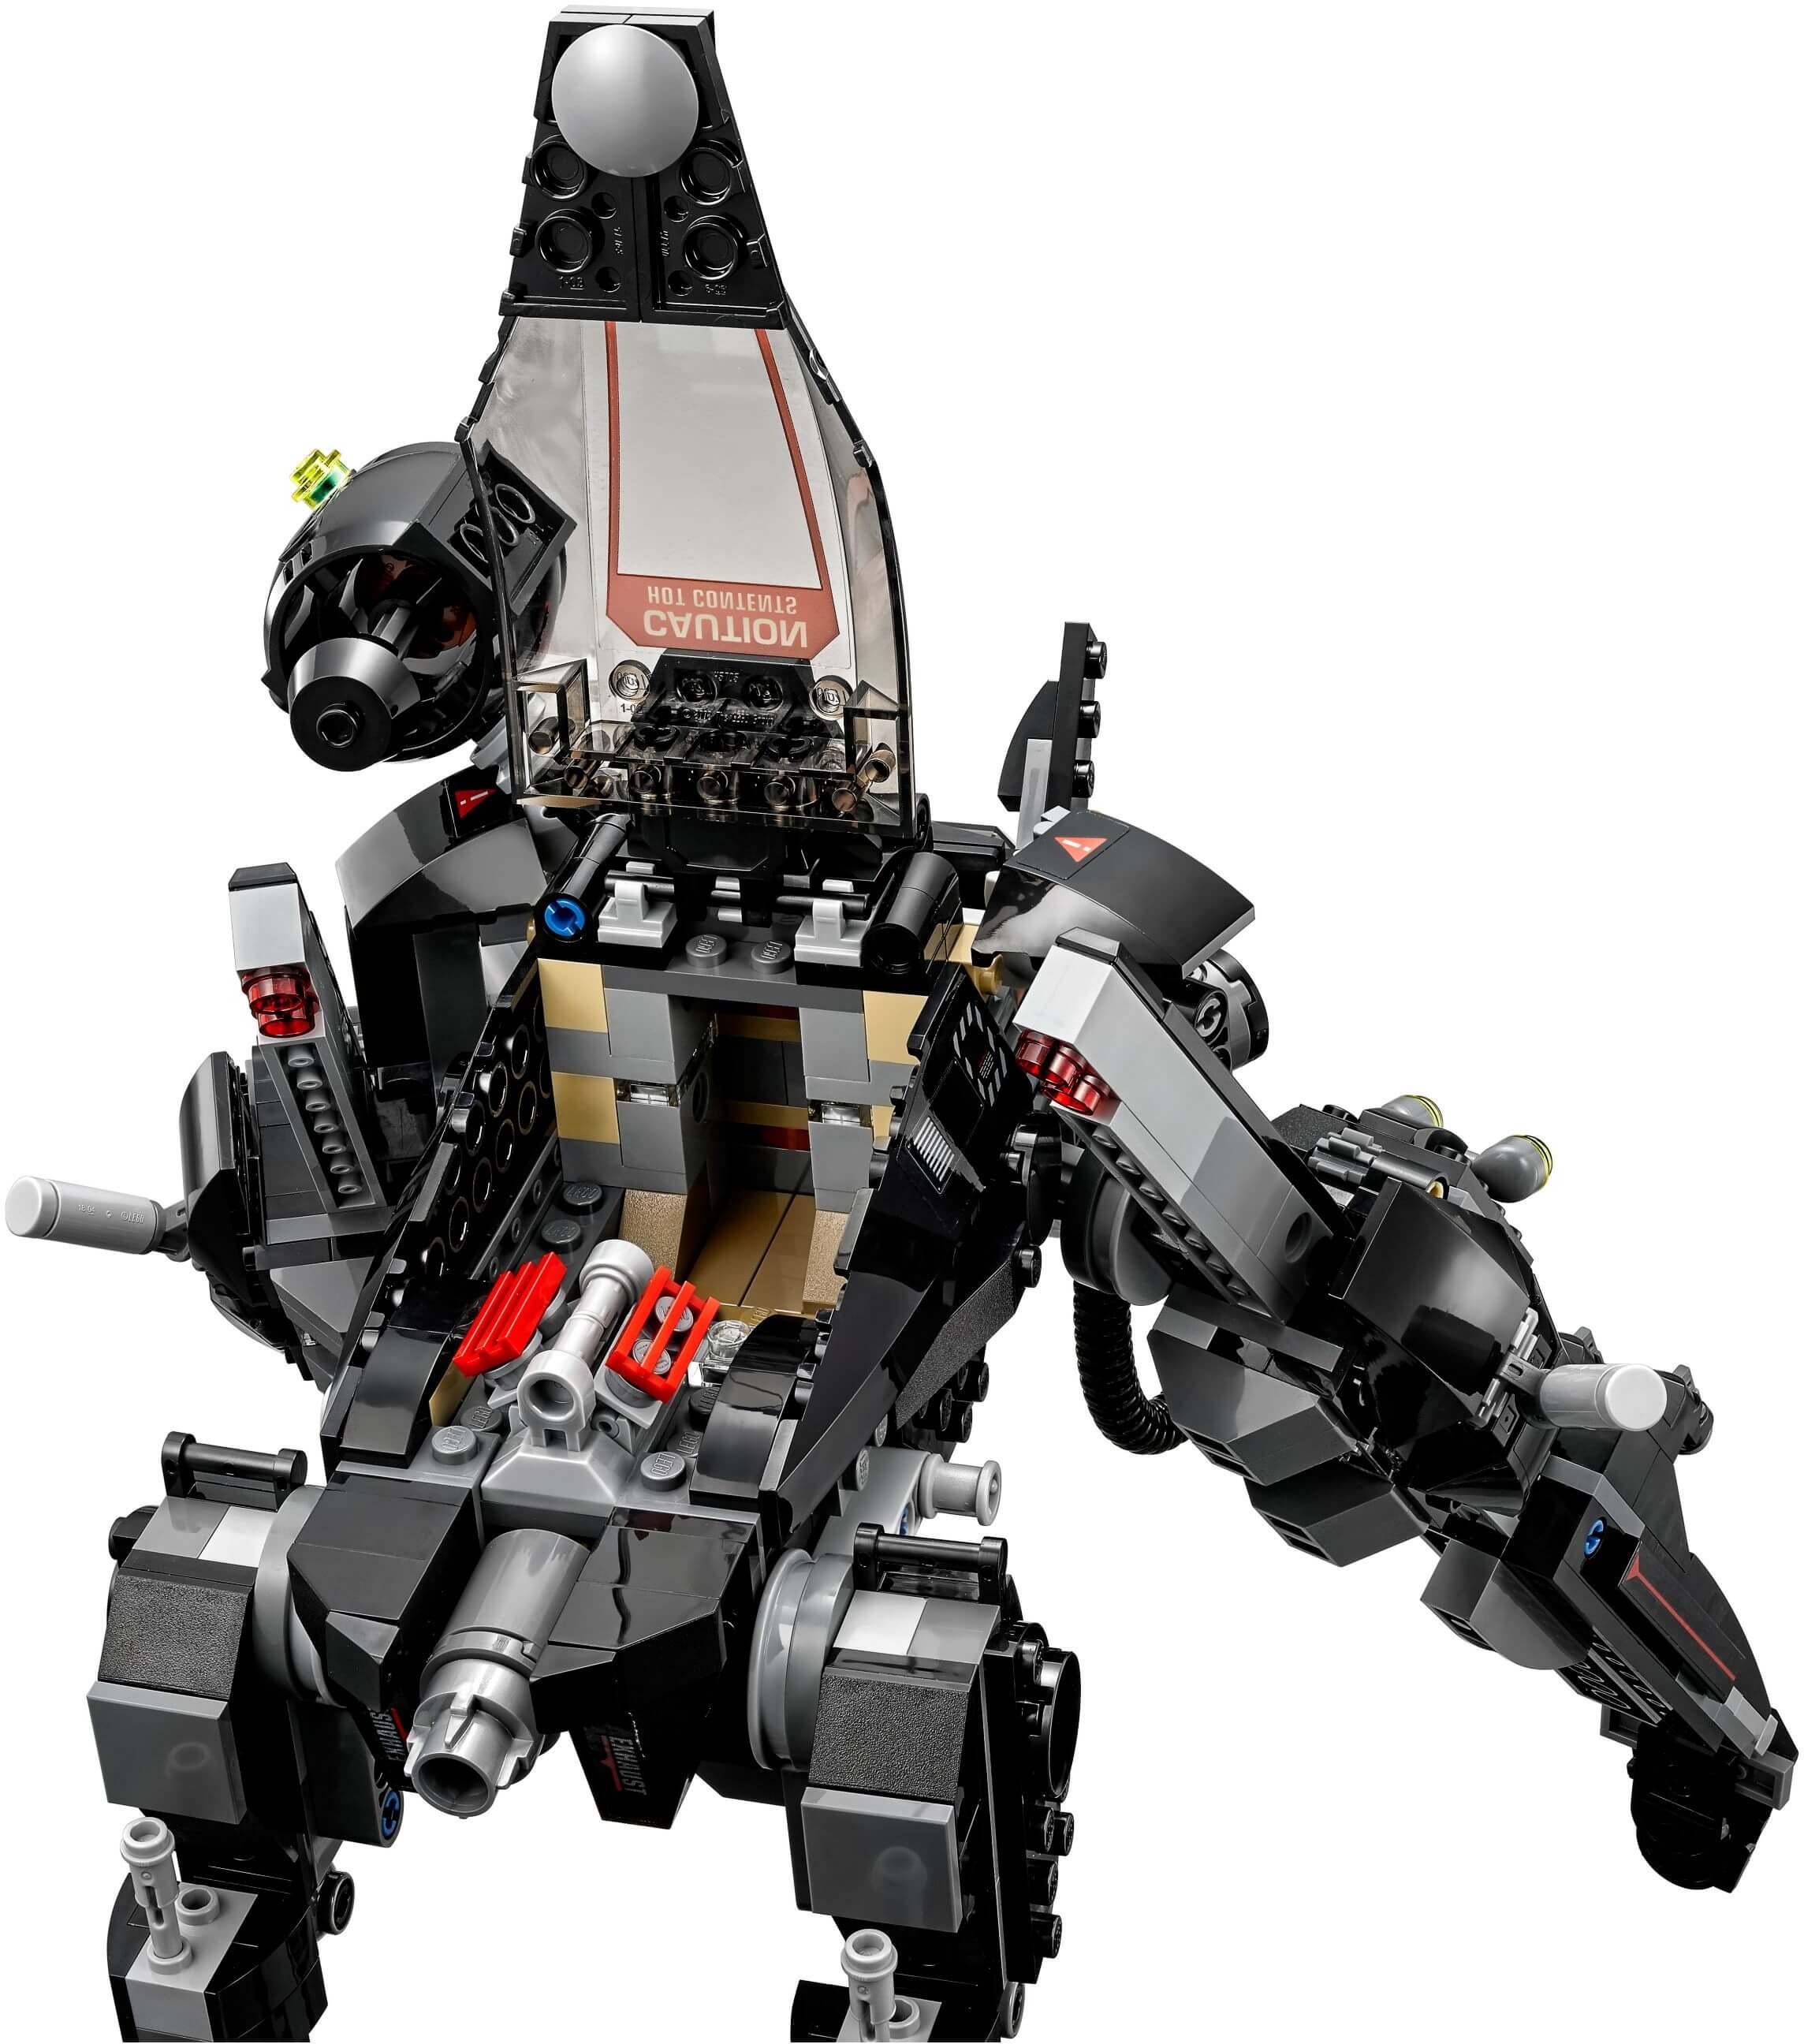 Mua đồ chơi LEGO 70908 - LEGO Batman Movie 70908 - Cỗ Máy Scuttler của Batman (LEGO 70908 The Scuttler)